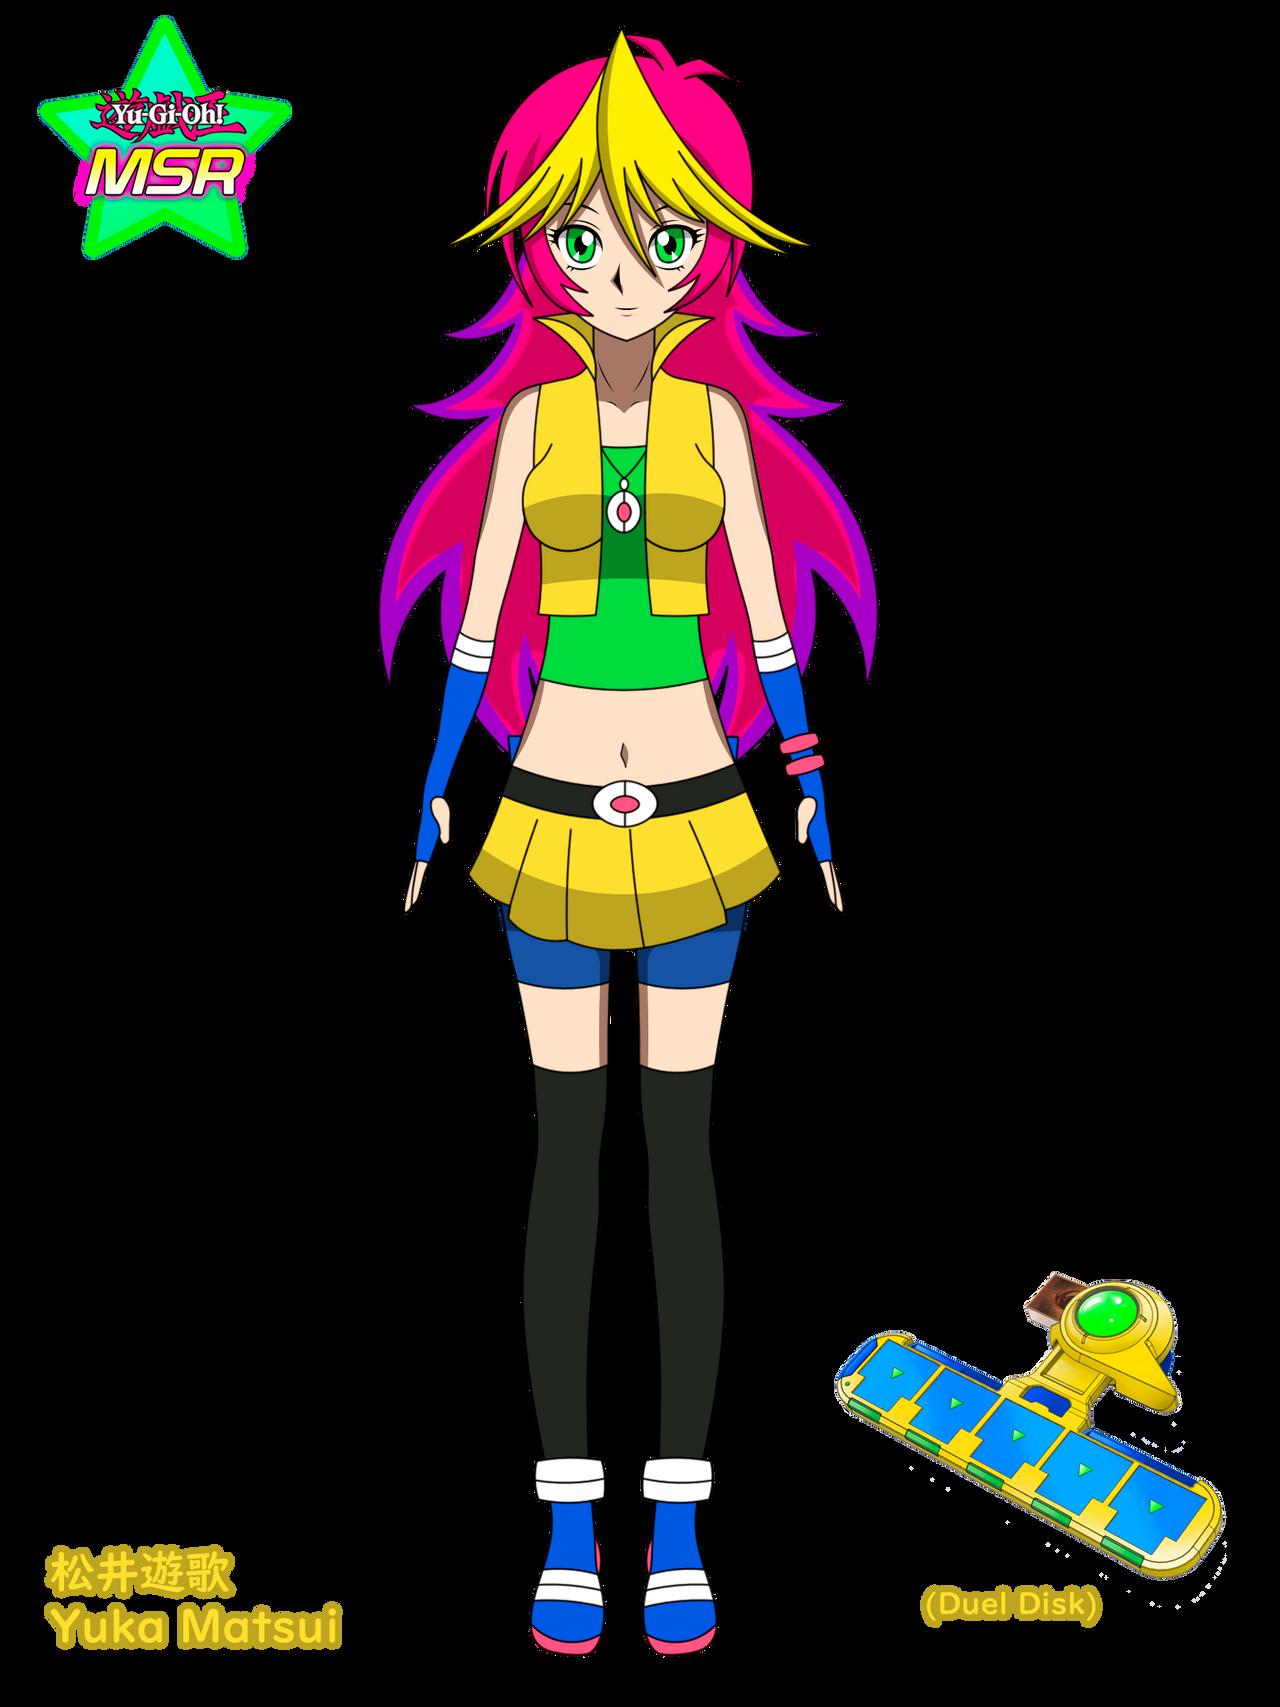 Yu-Gi-Oh! protagonist OC - Yuka Matsui